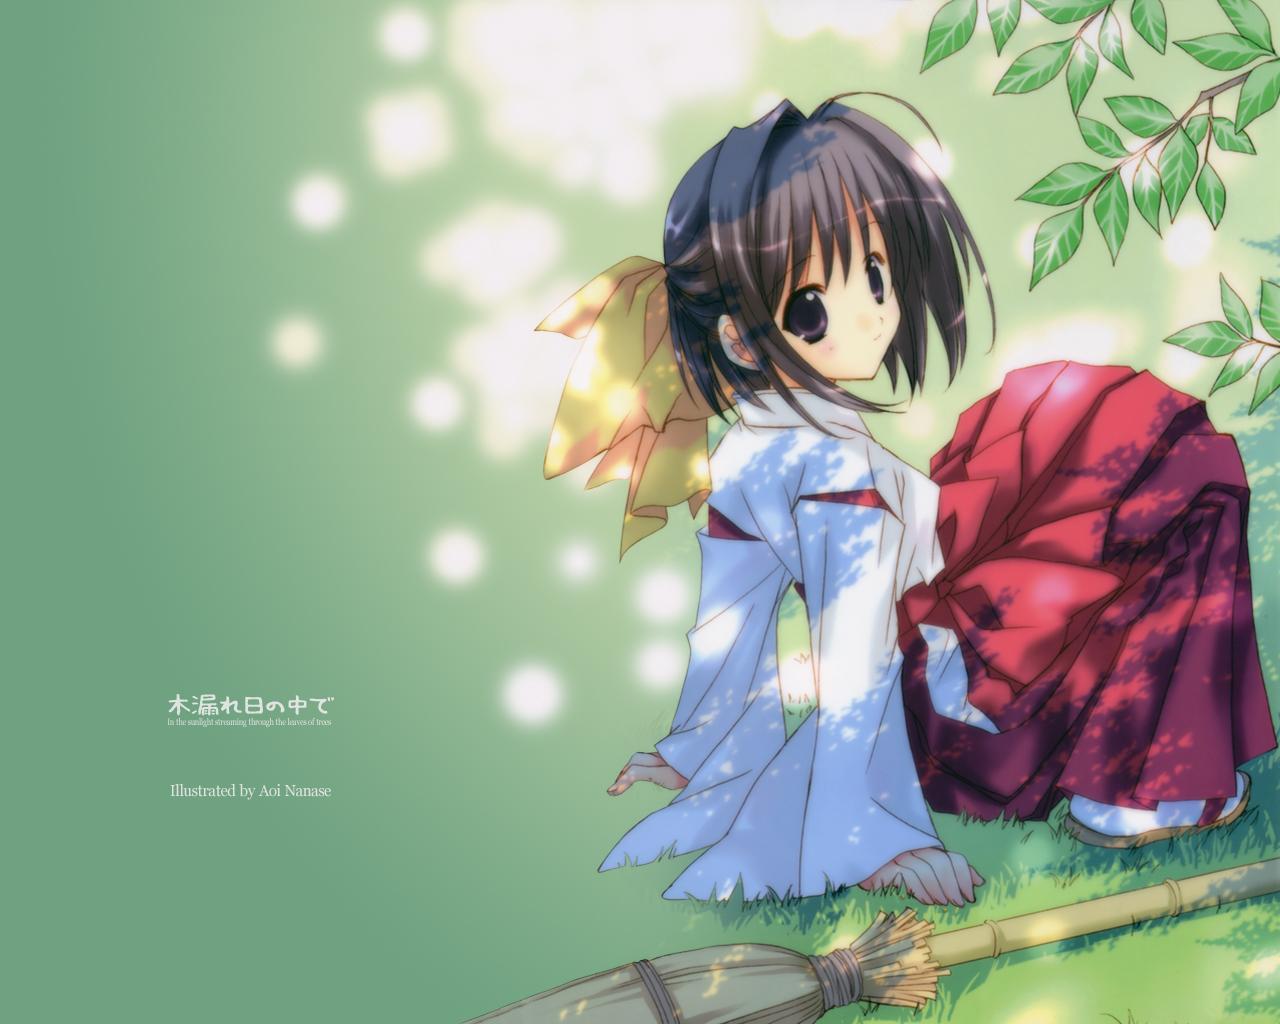 japanese_clothes miko nanase_aoi